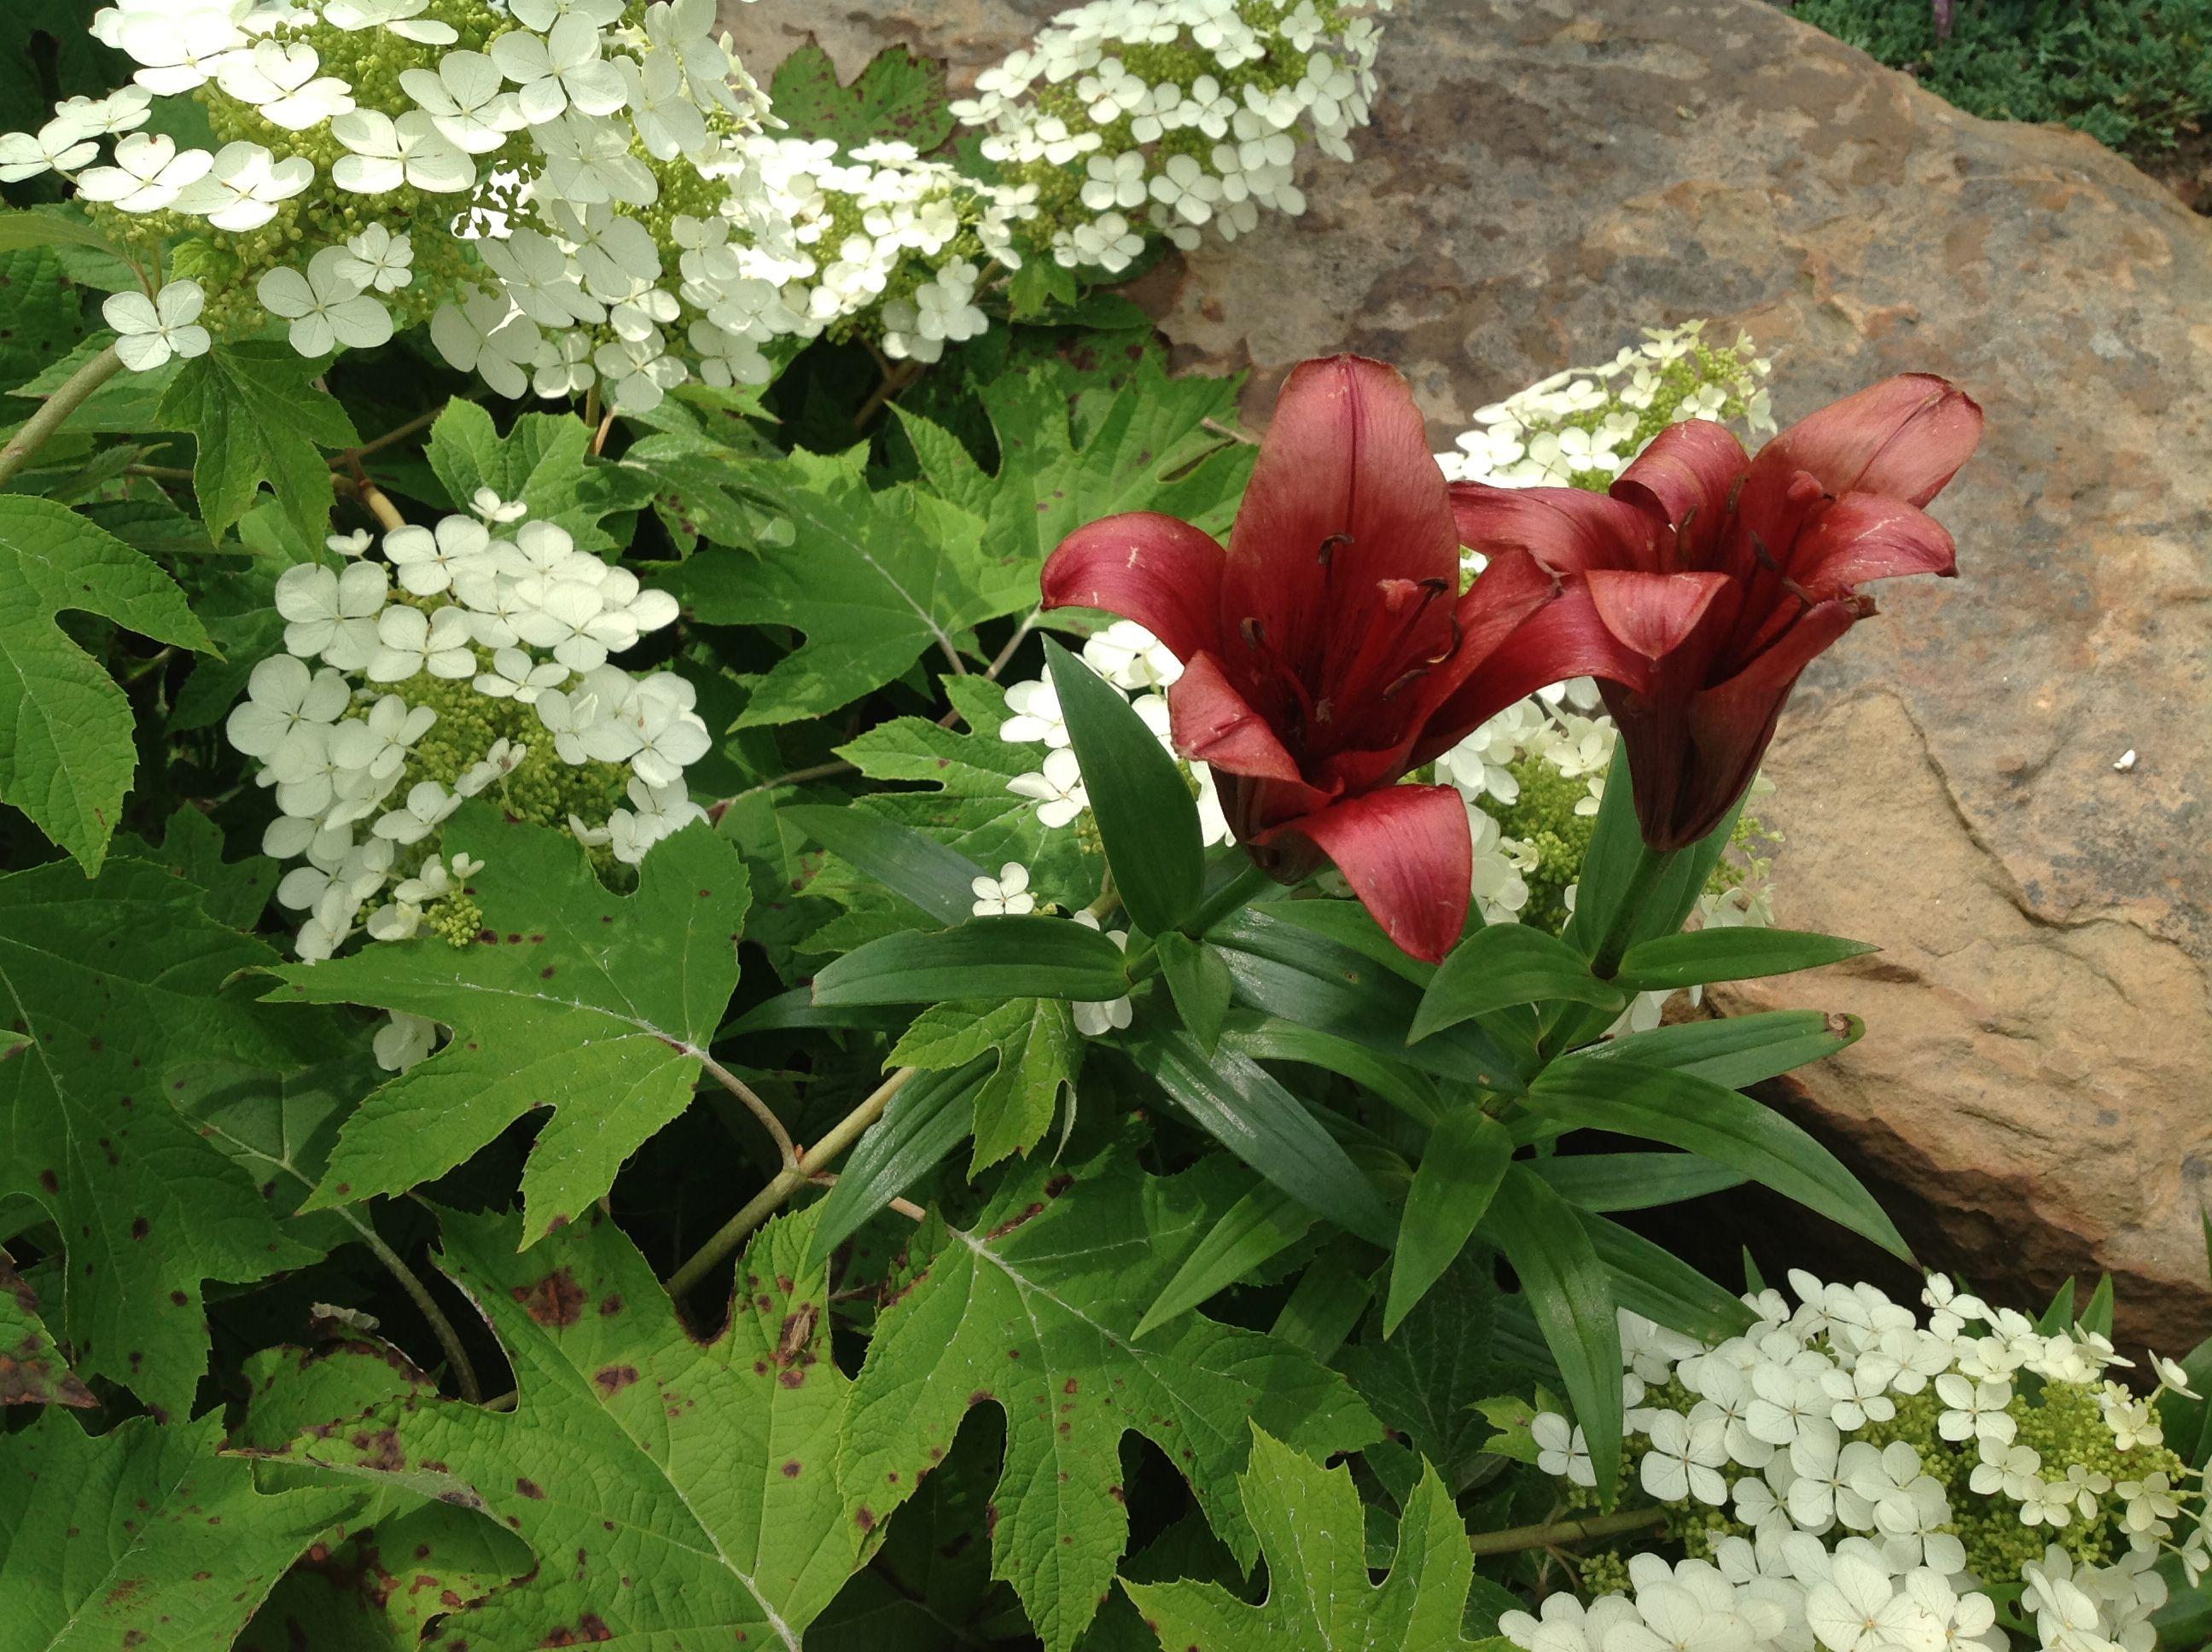 Oak leaf hydrangea and lily.